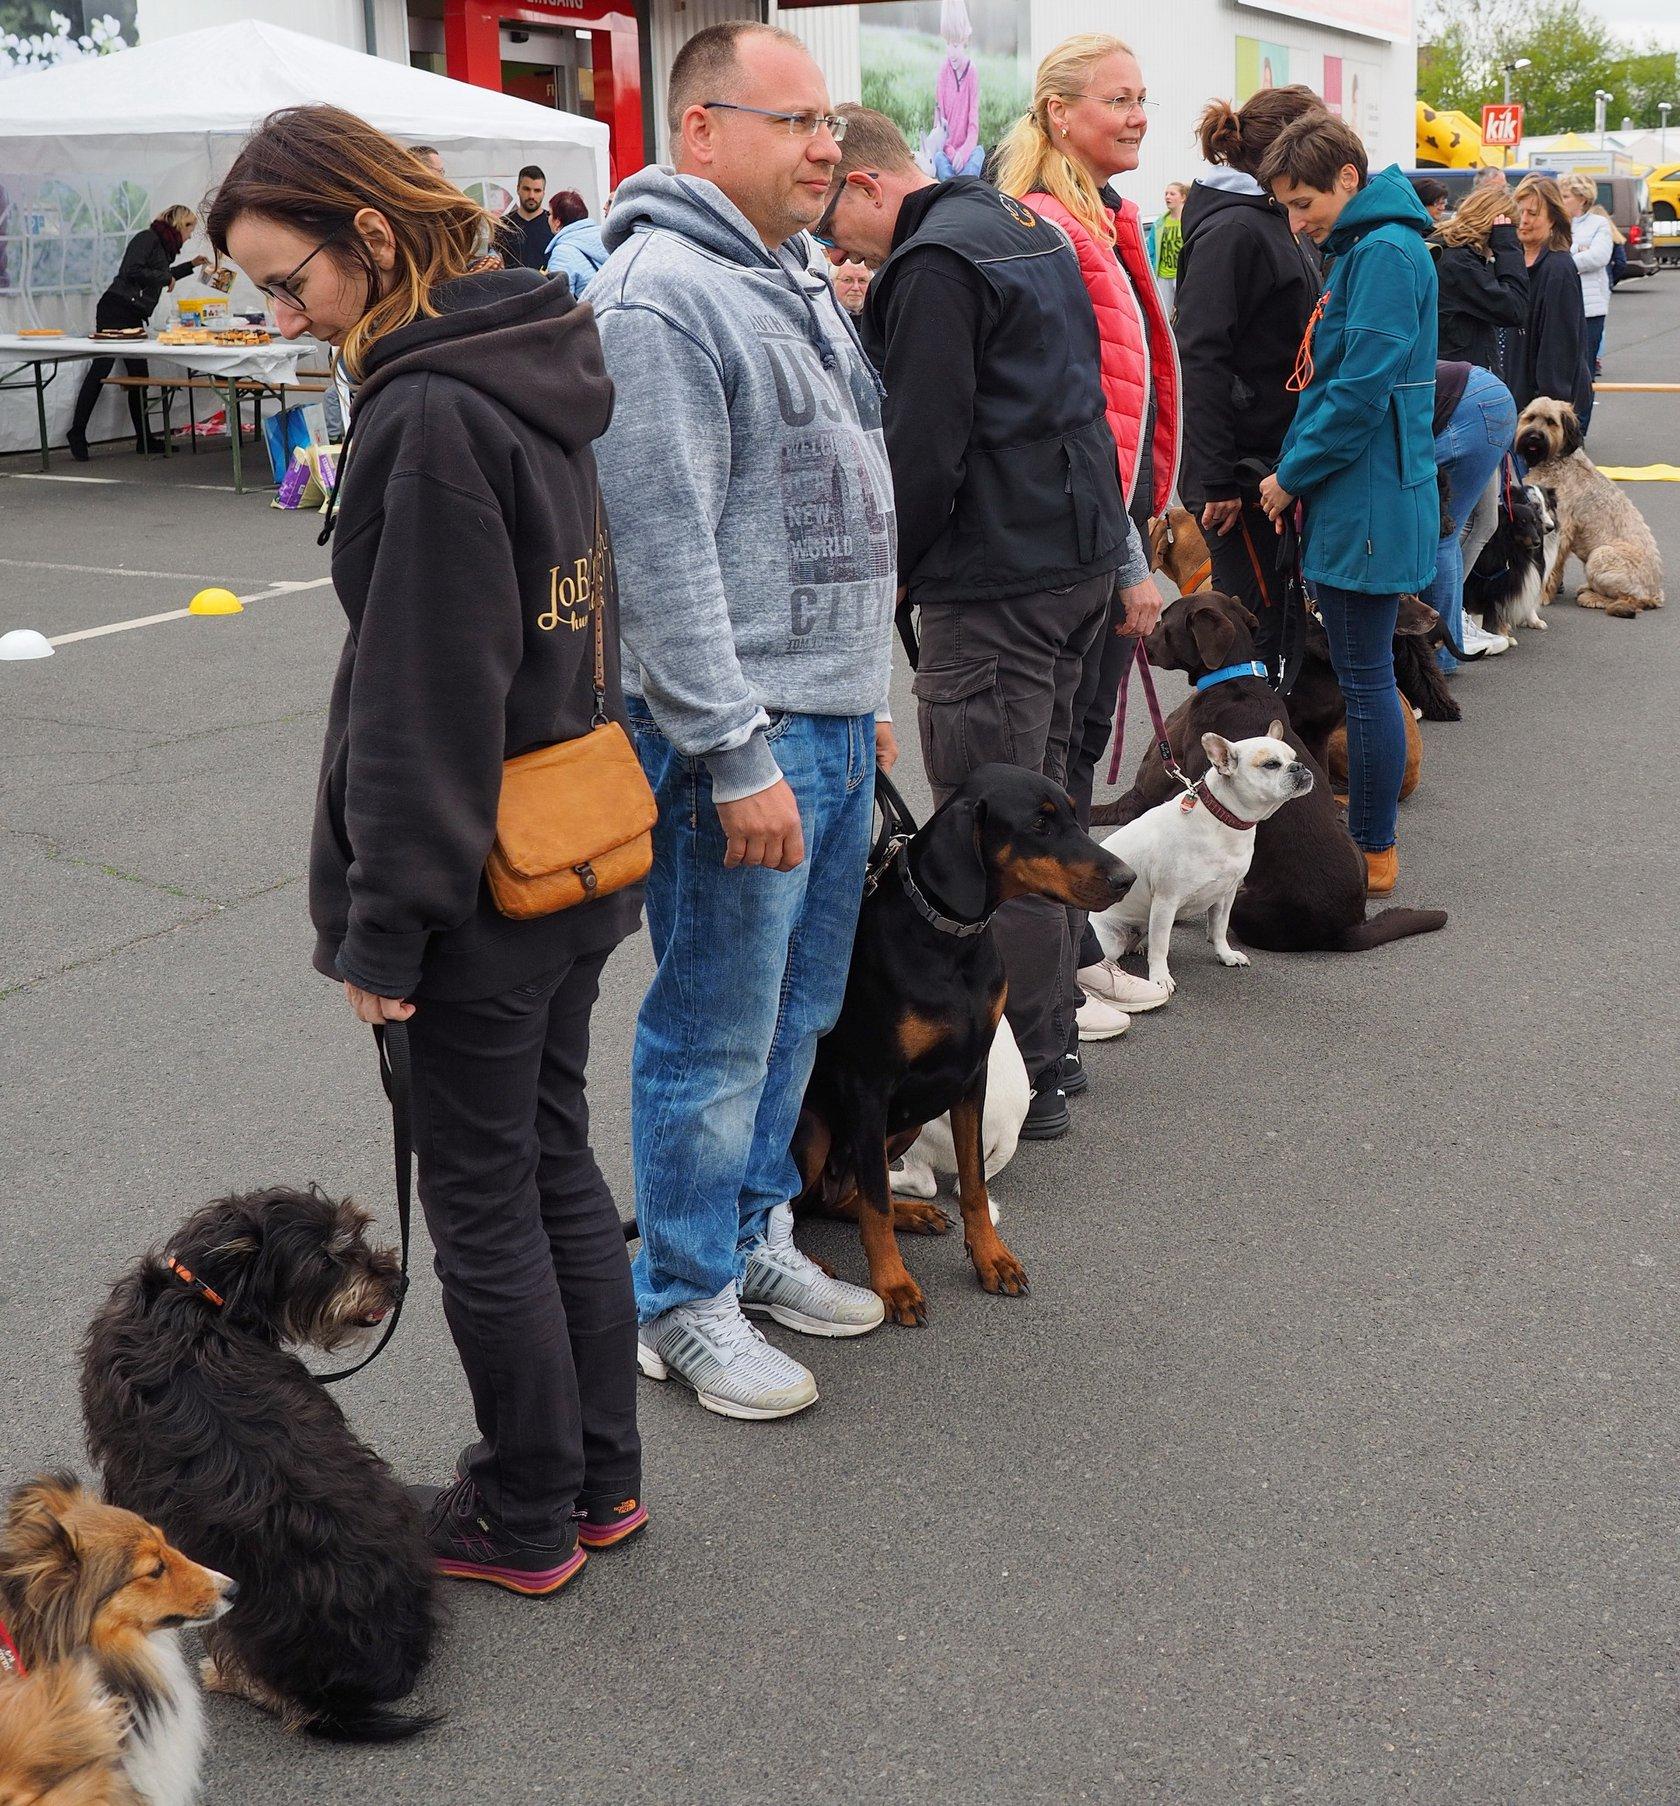 JoBaDog_Frühlingsfest_Fressnapf_Oranienburg_2019_7.jpg